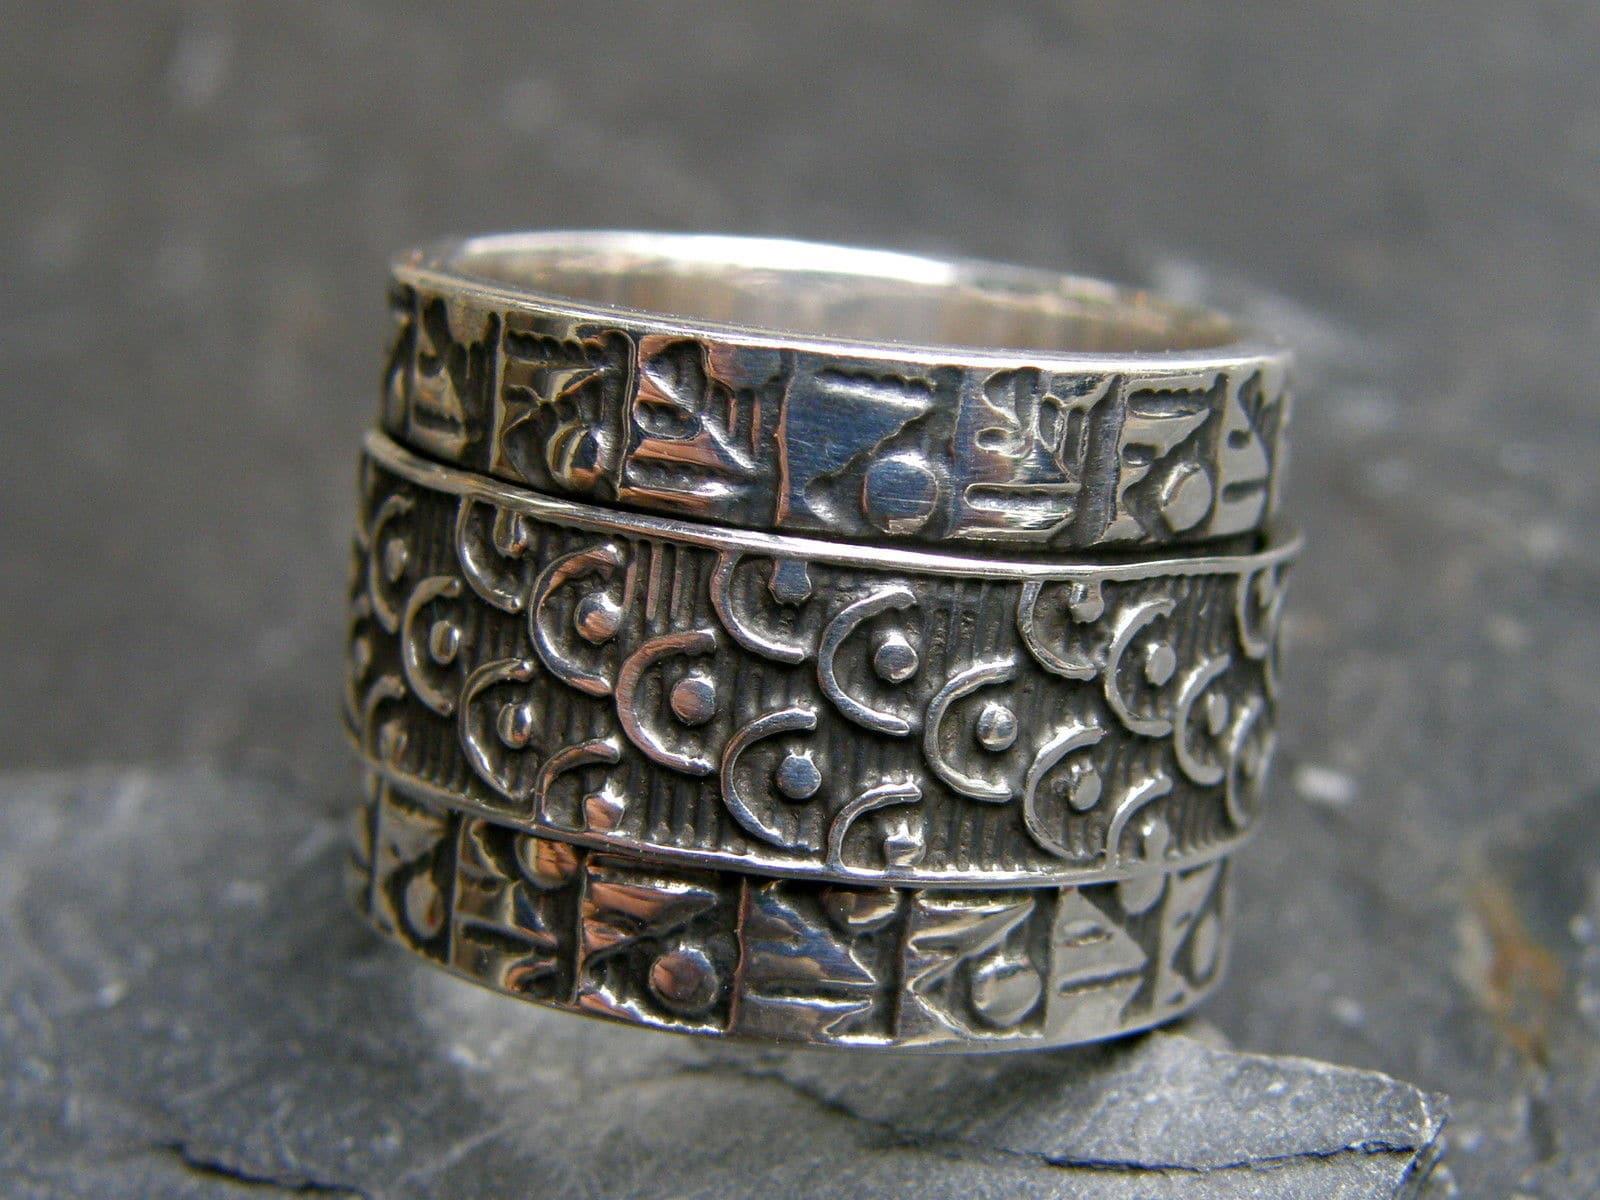 Designer Ring Silber 925 mit ornamentalem Muster beweglich 56